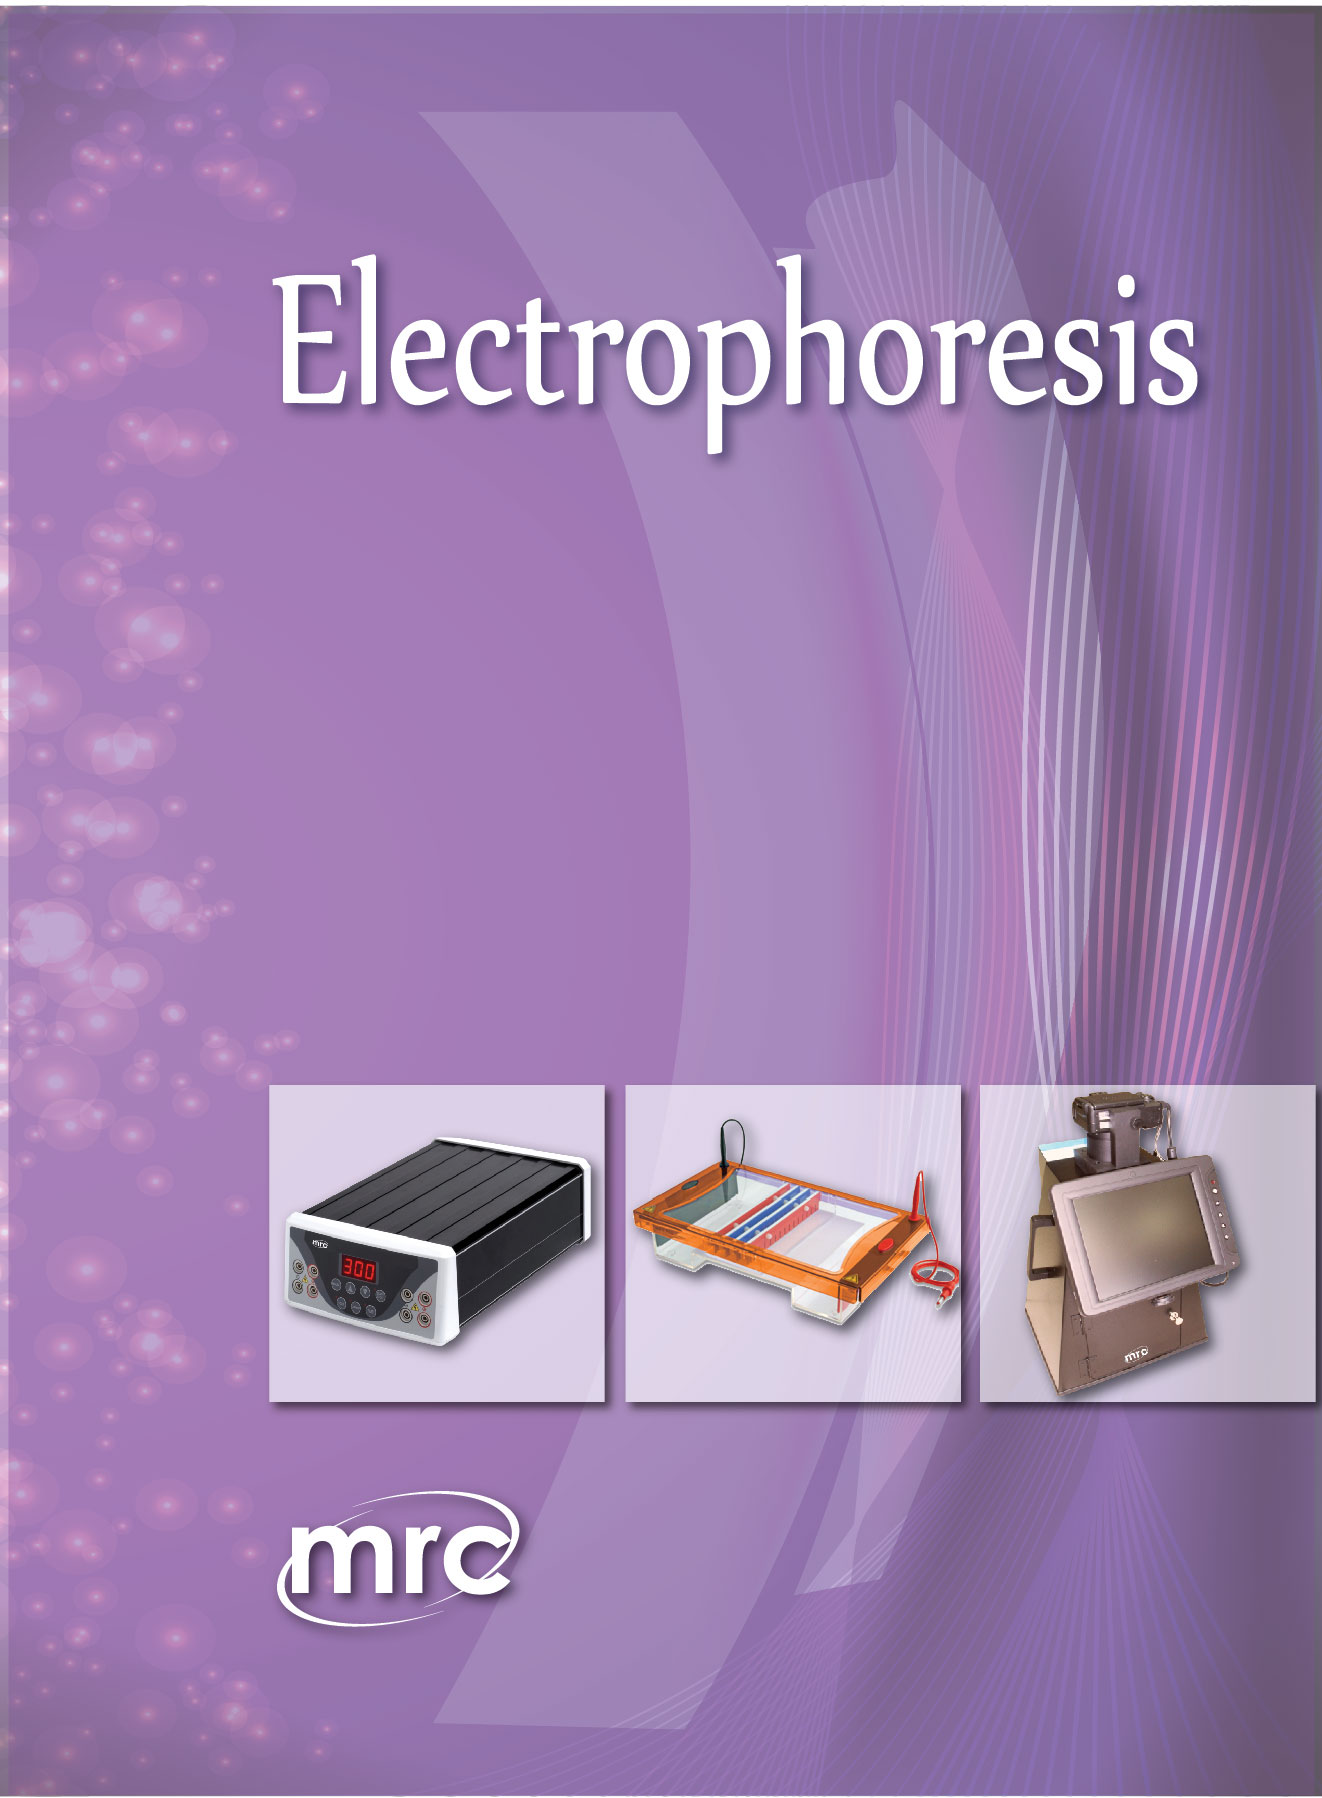 ElectroPhoresis.jpg